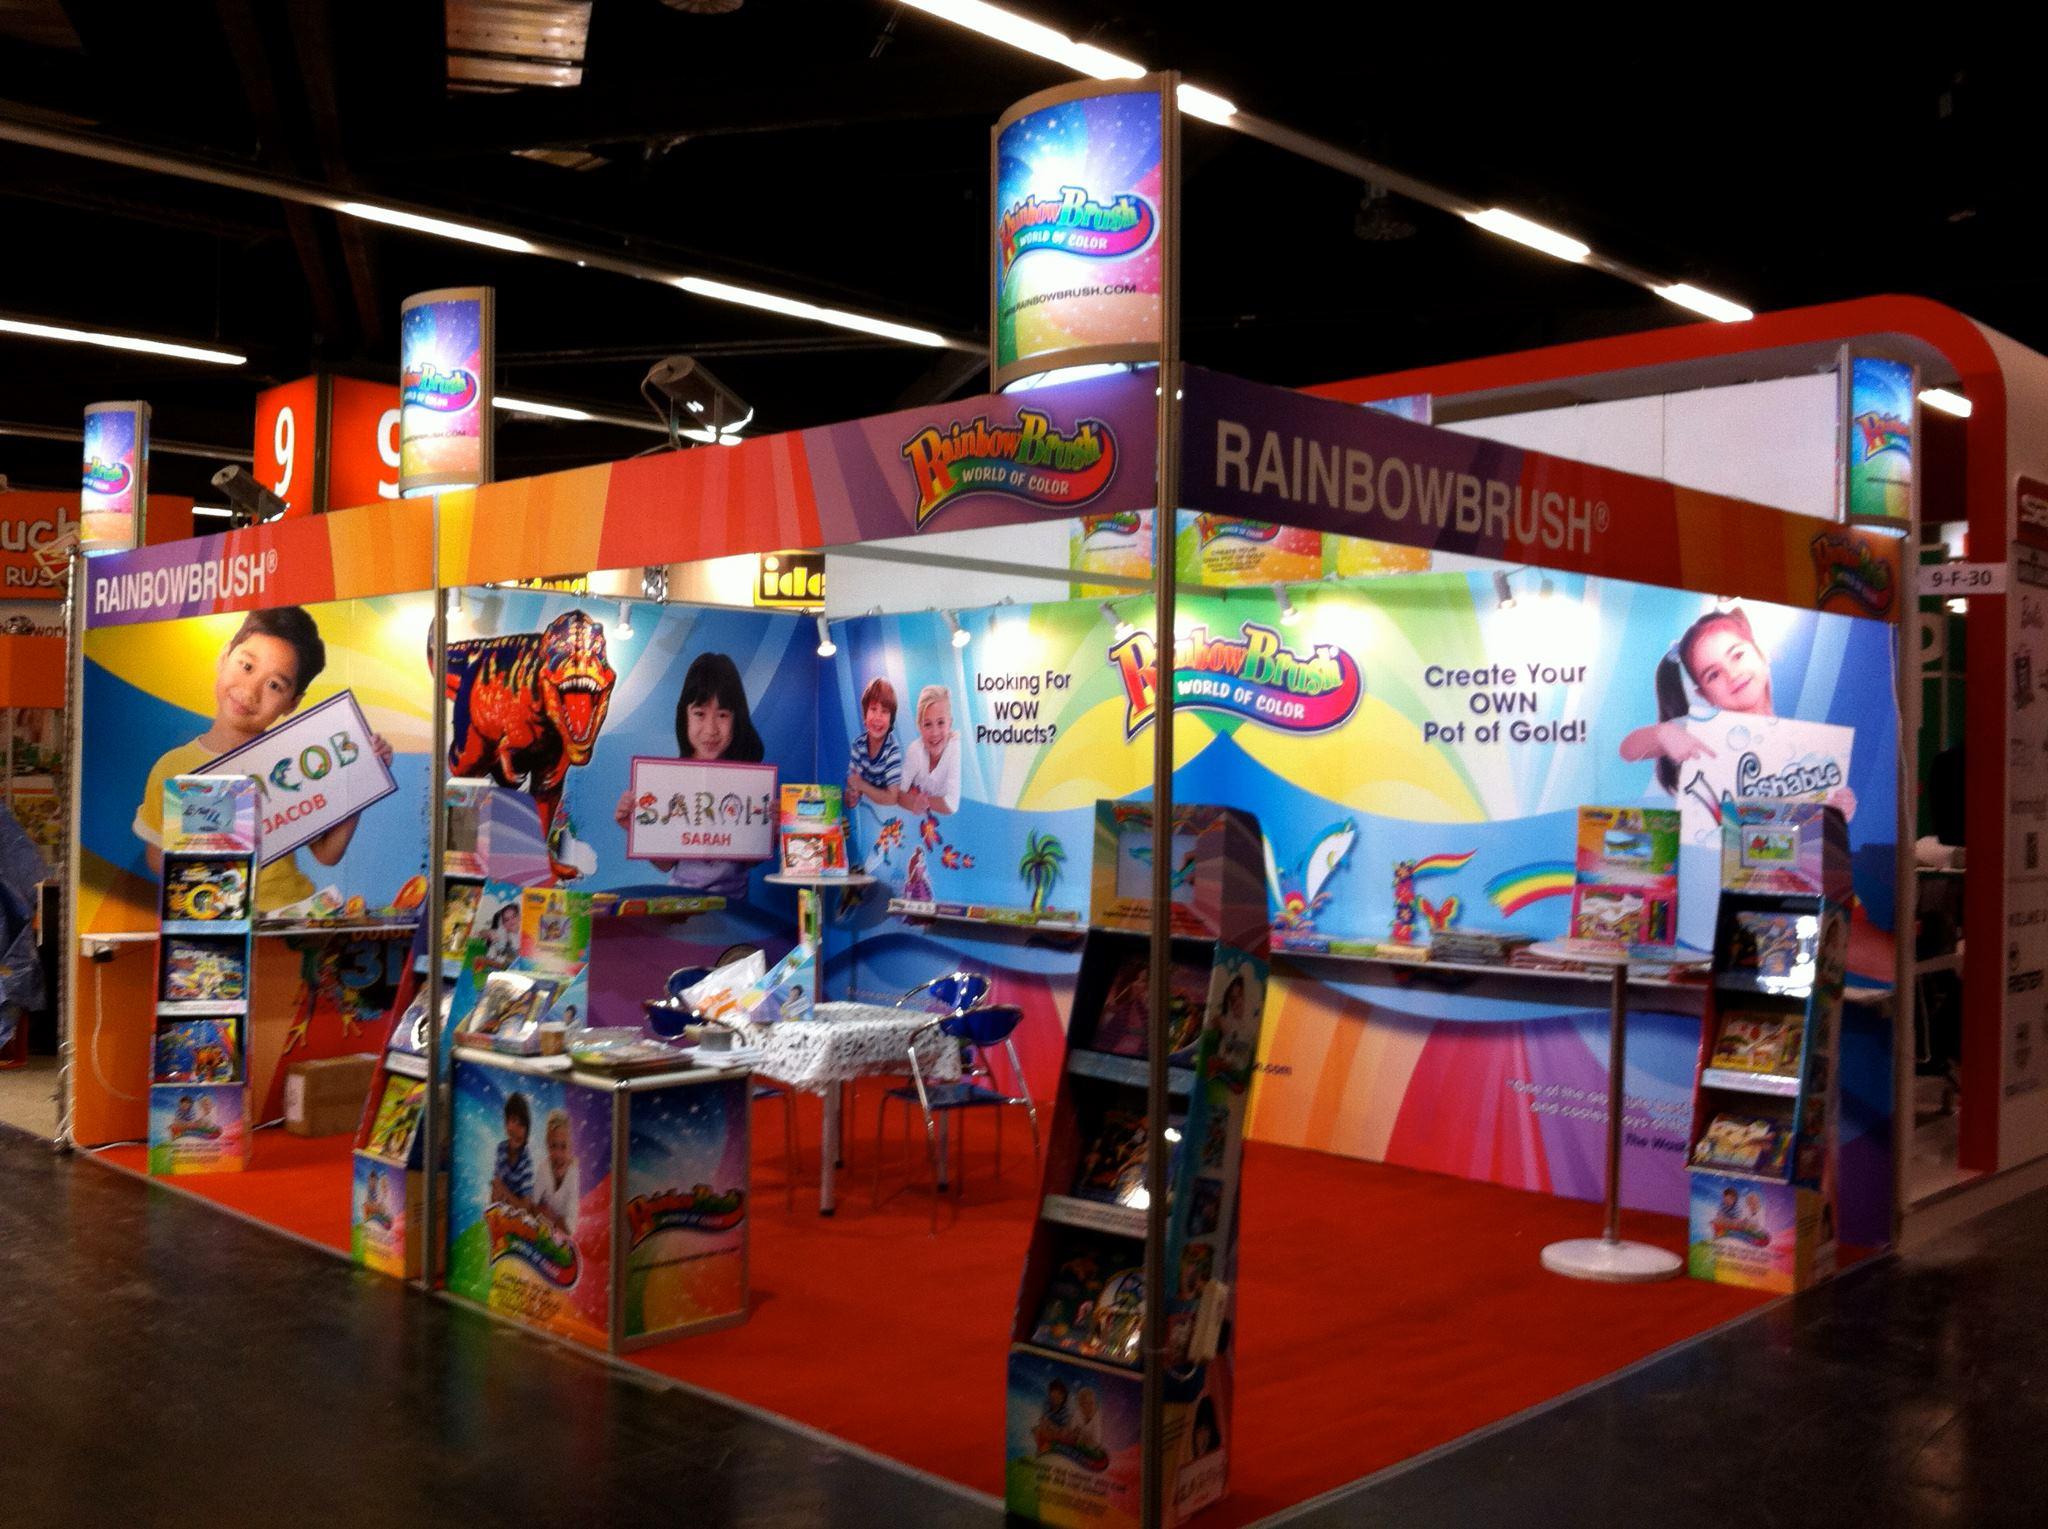 RainbowBrush offers Kids arts & crafts educational toys